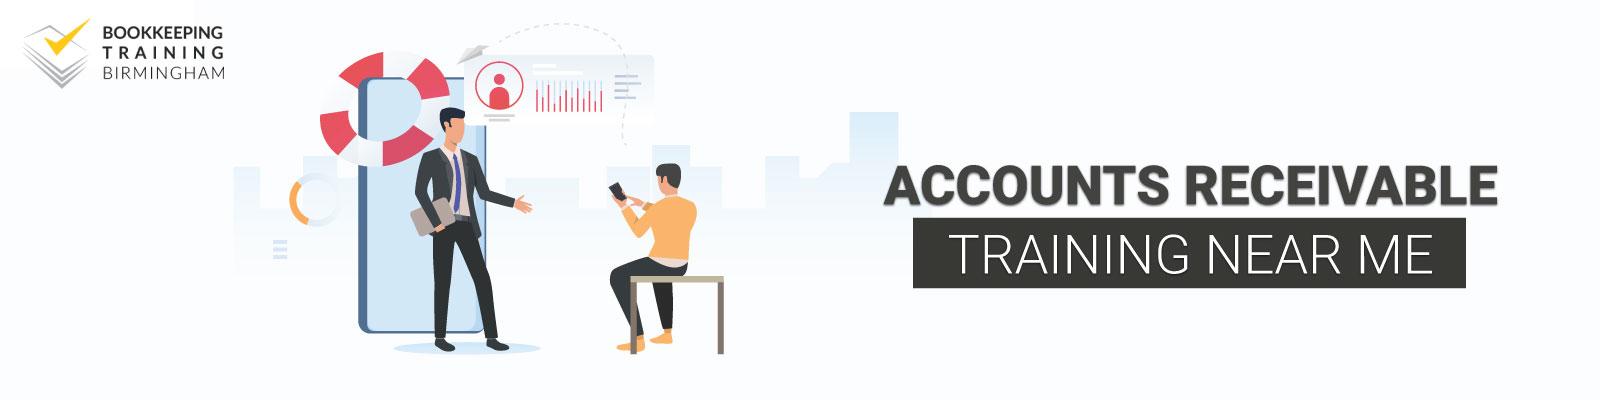 accounts-receivable-training-near-me